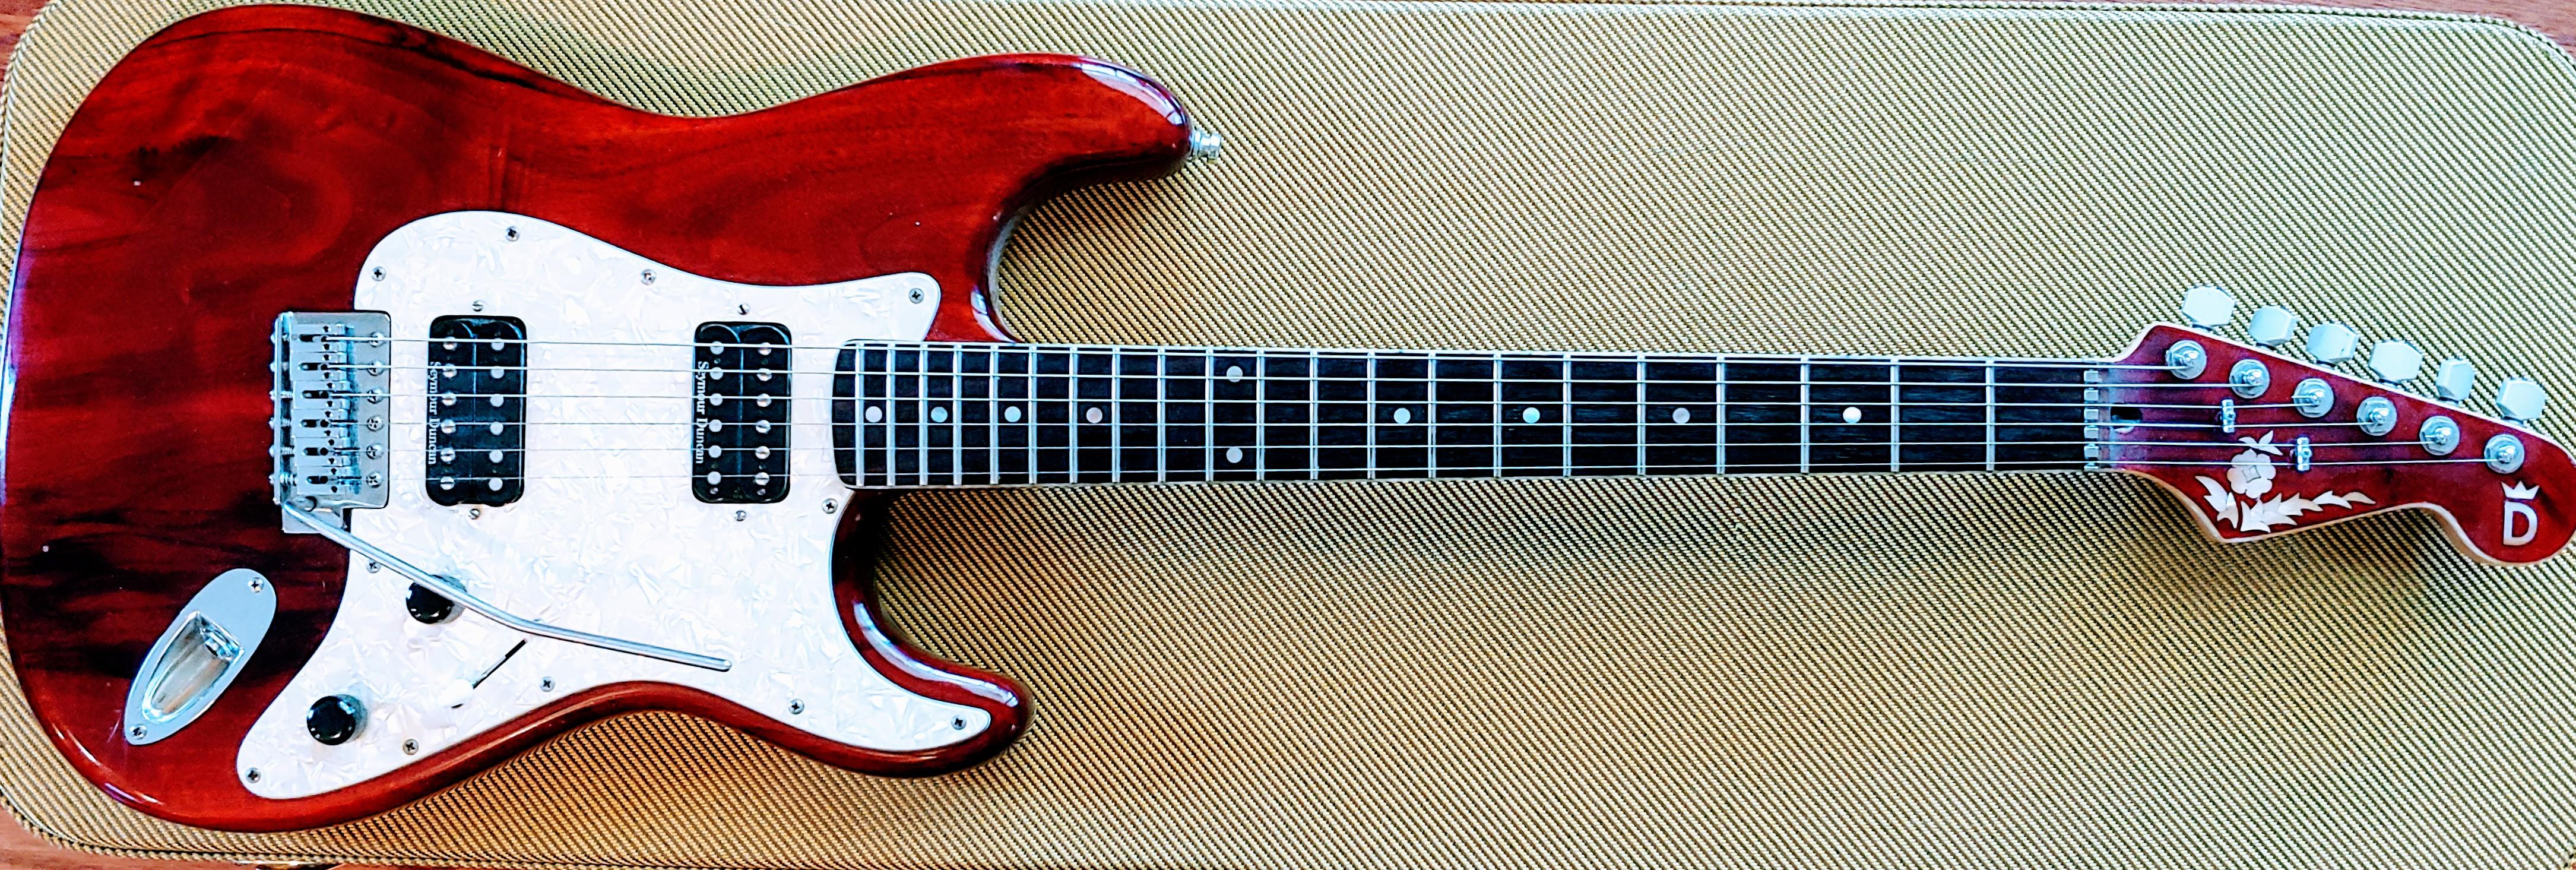 Peter Davidoff Custom Boutique guitar